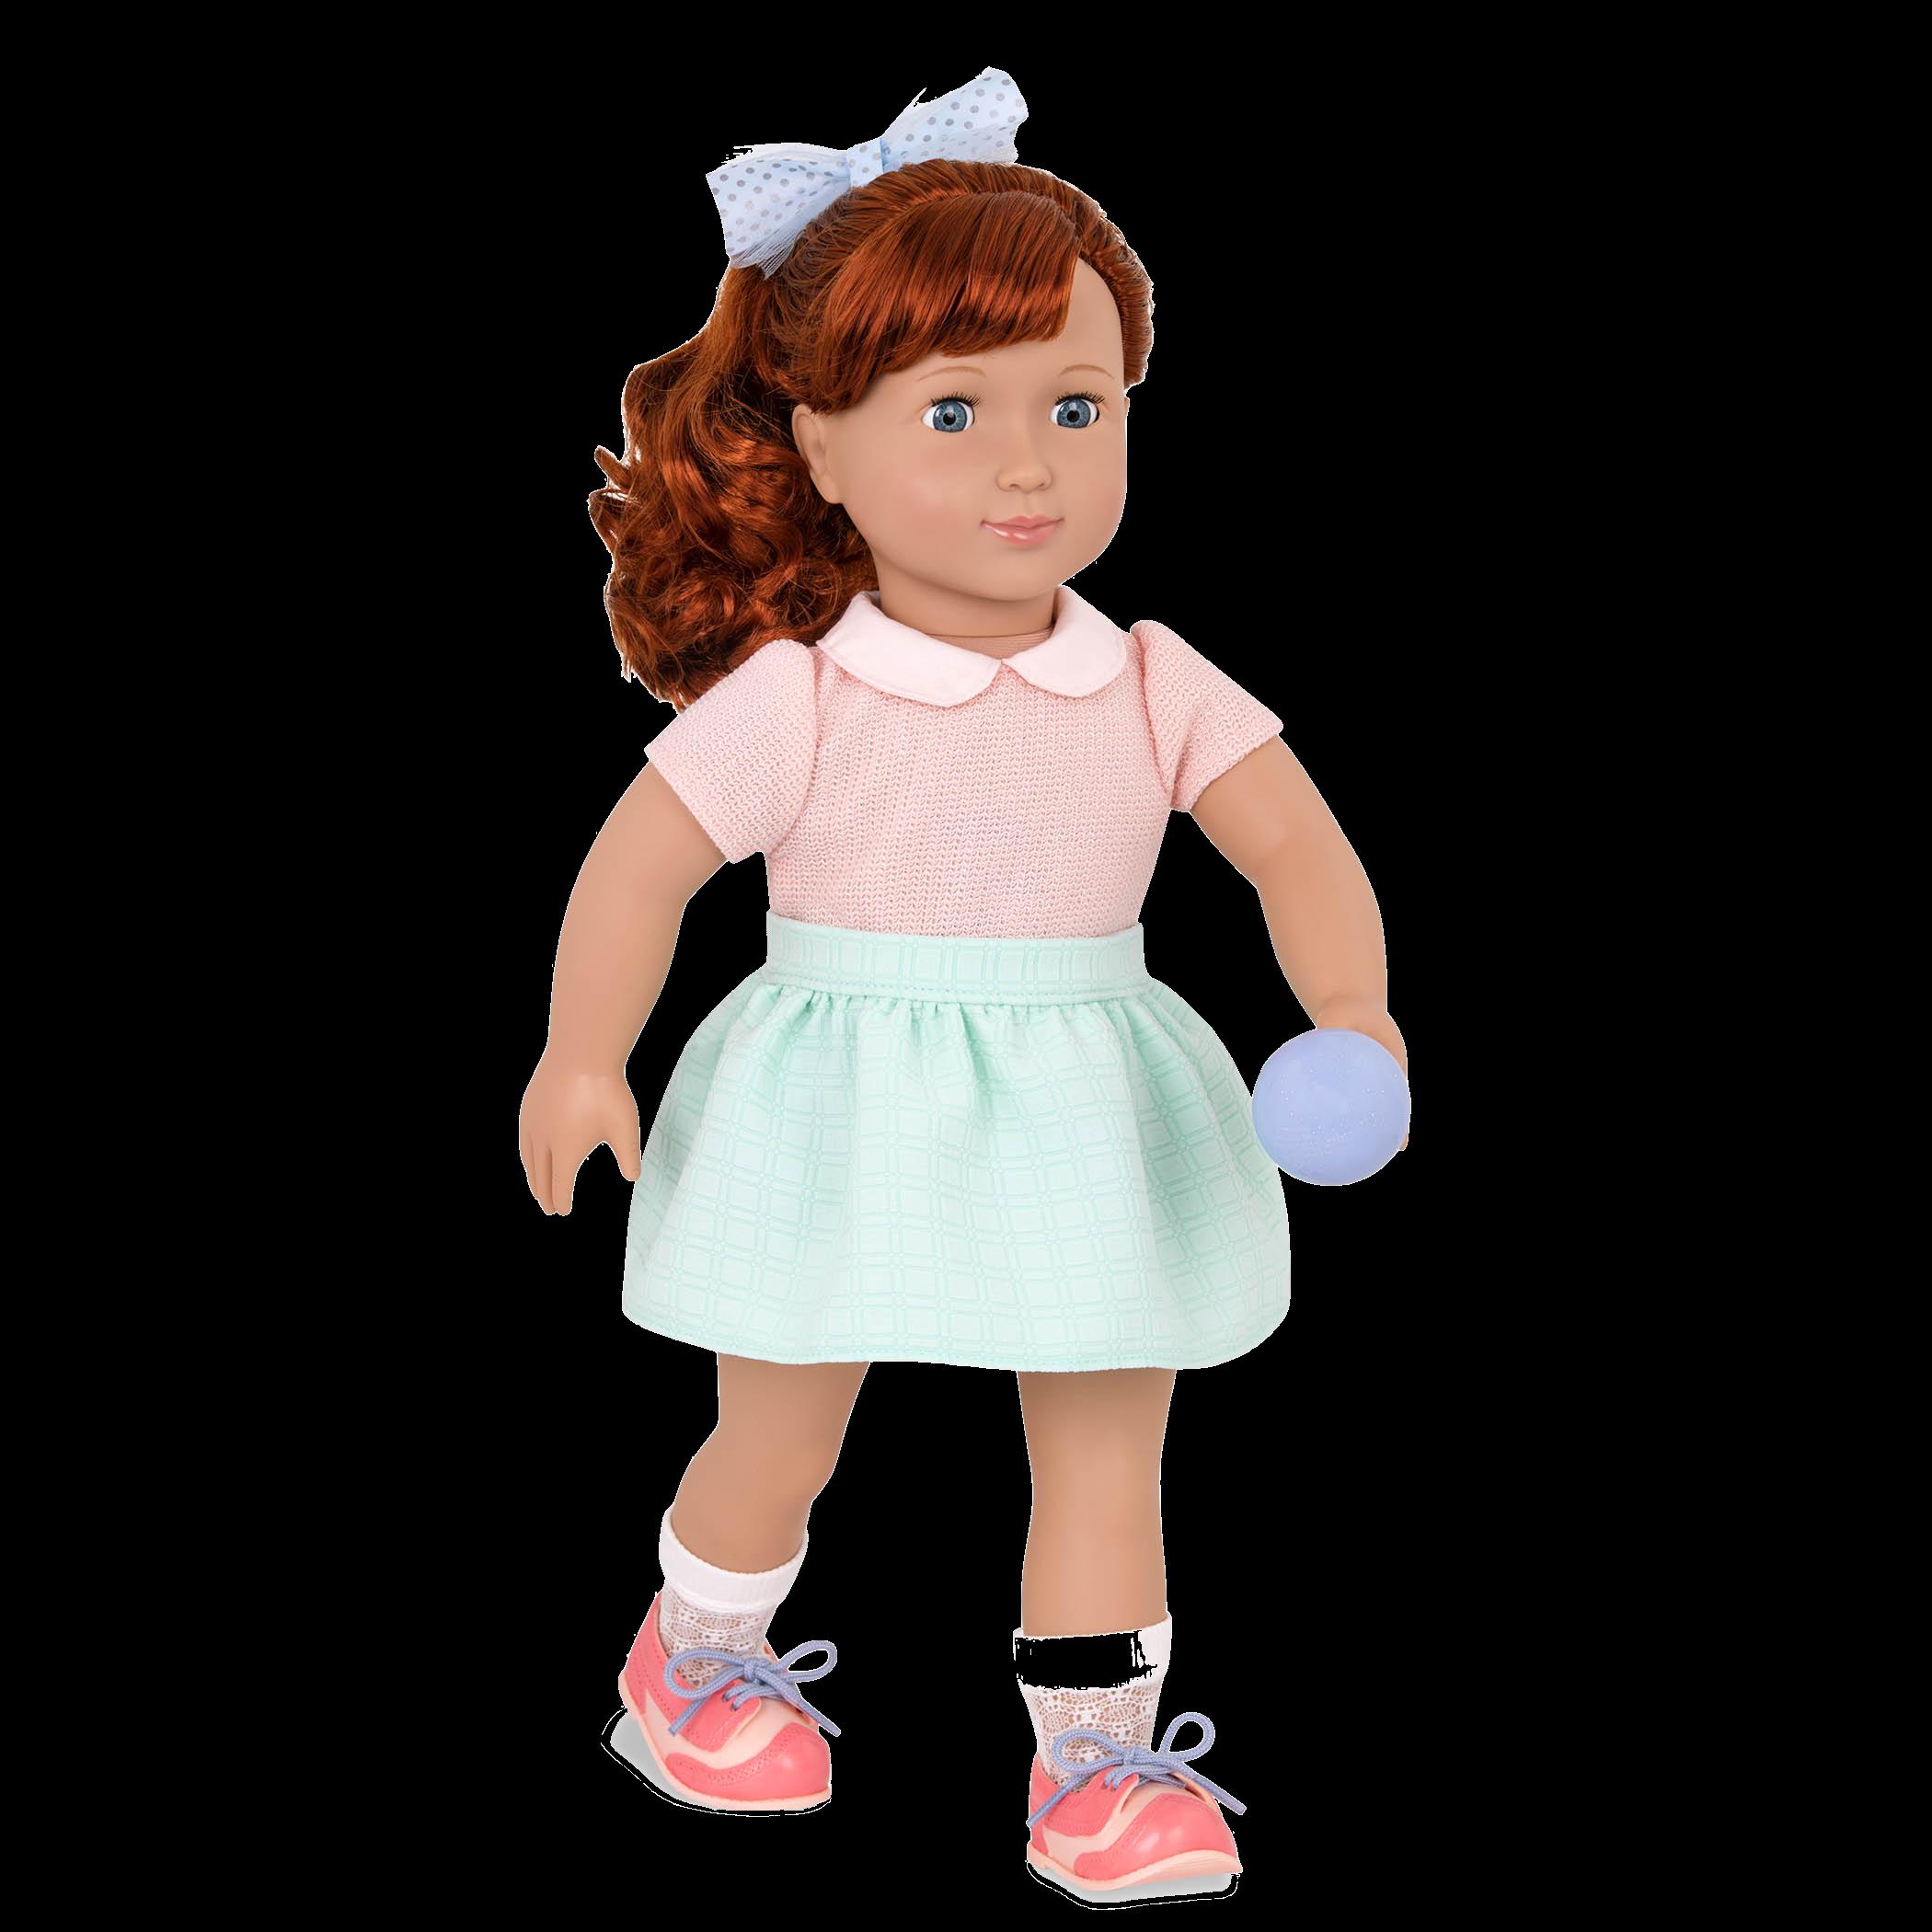 Kaye Retro 18-inch Bowling Doll